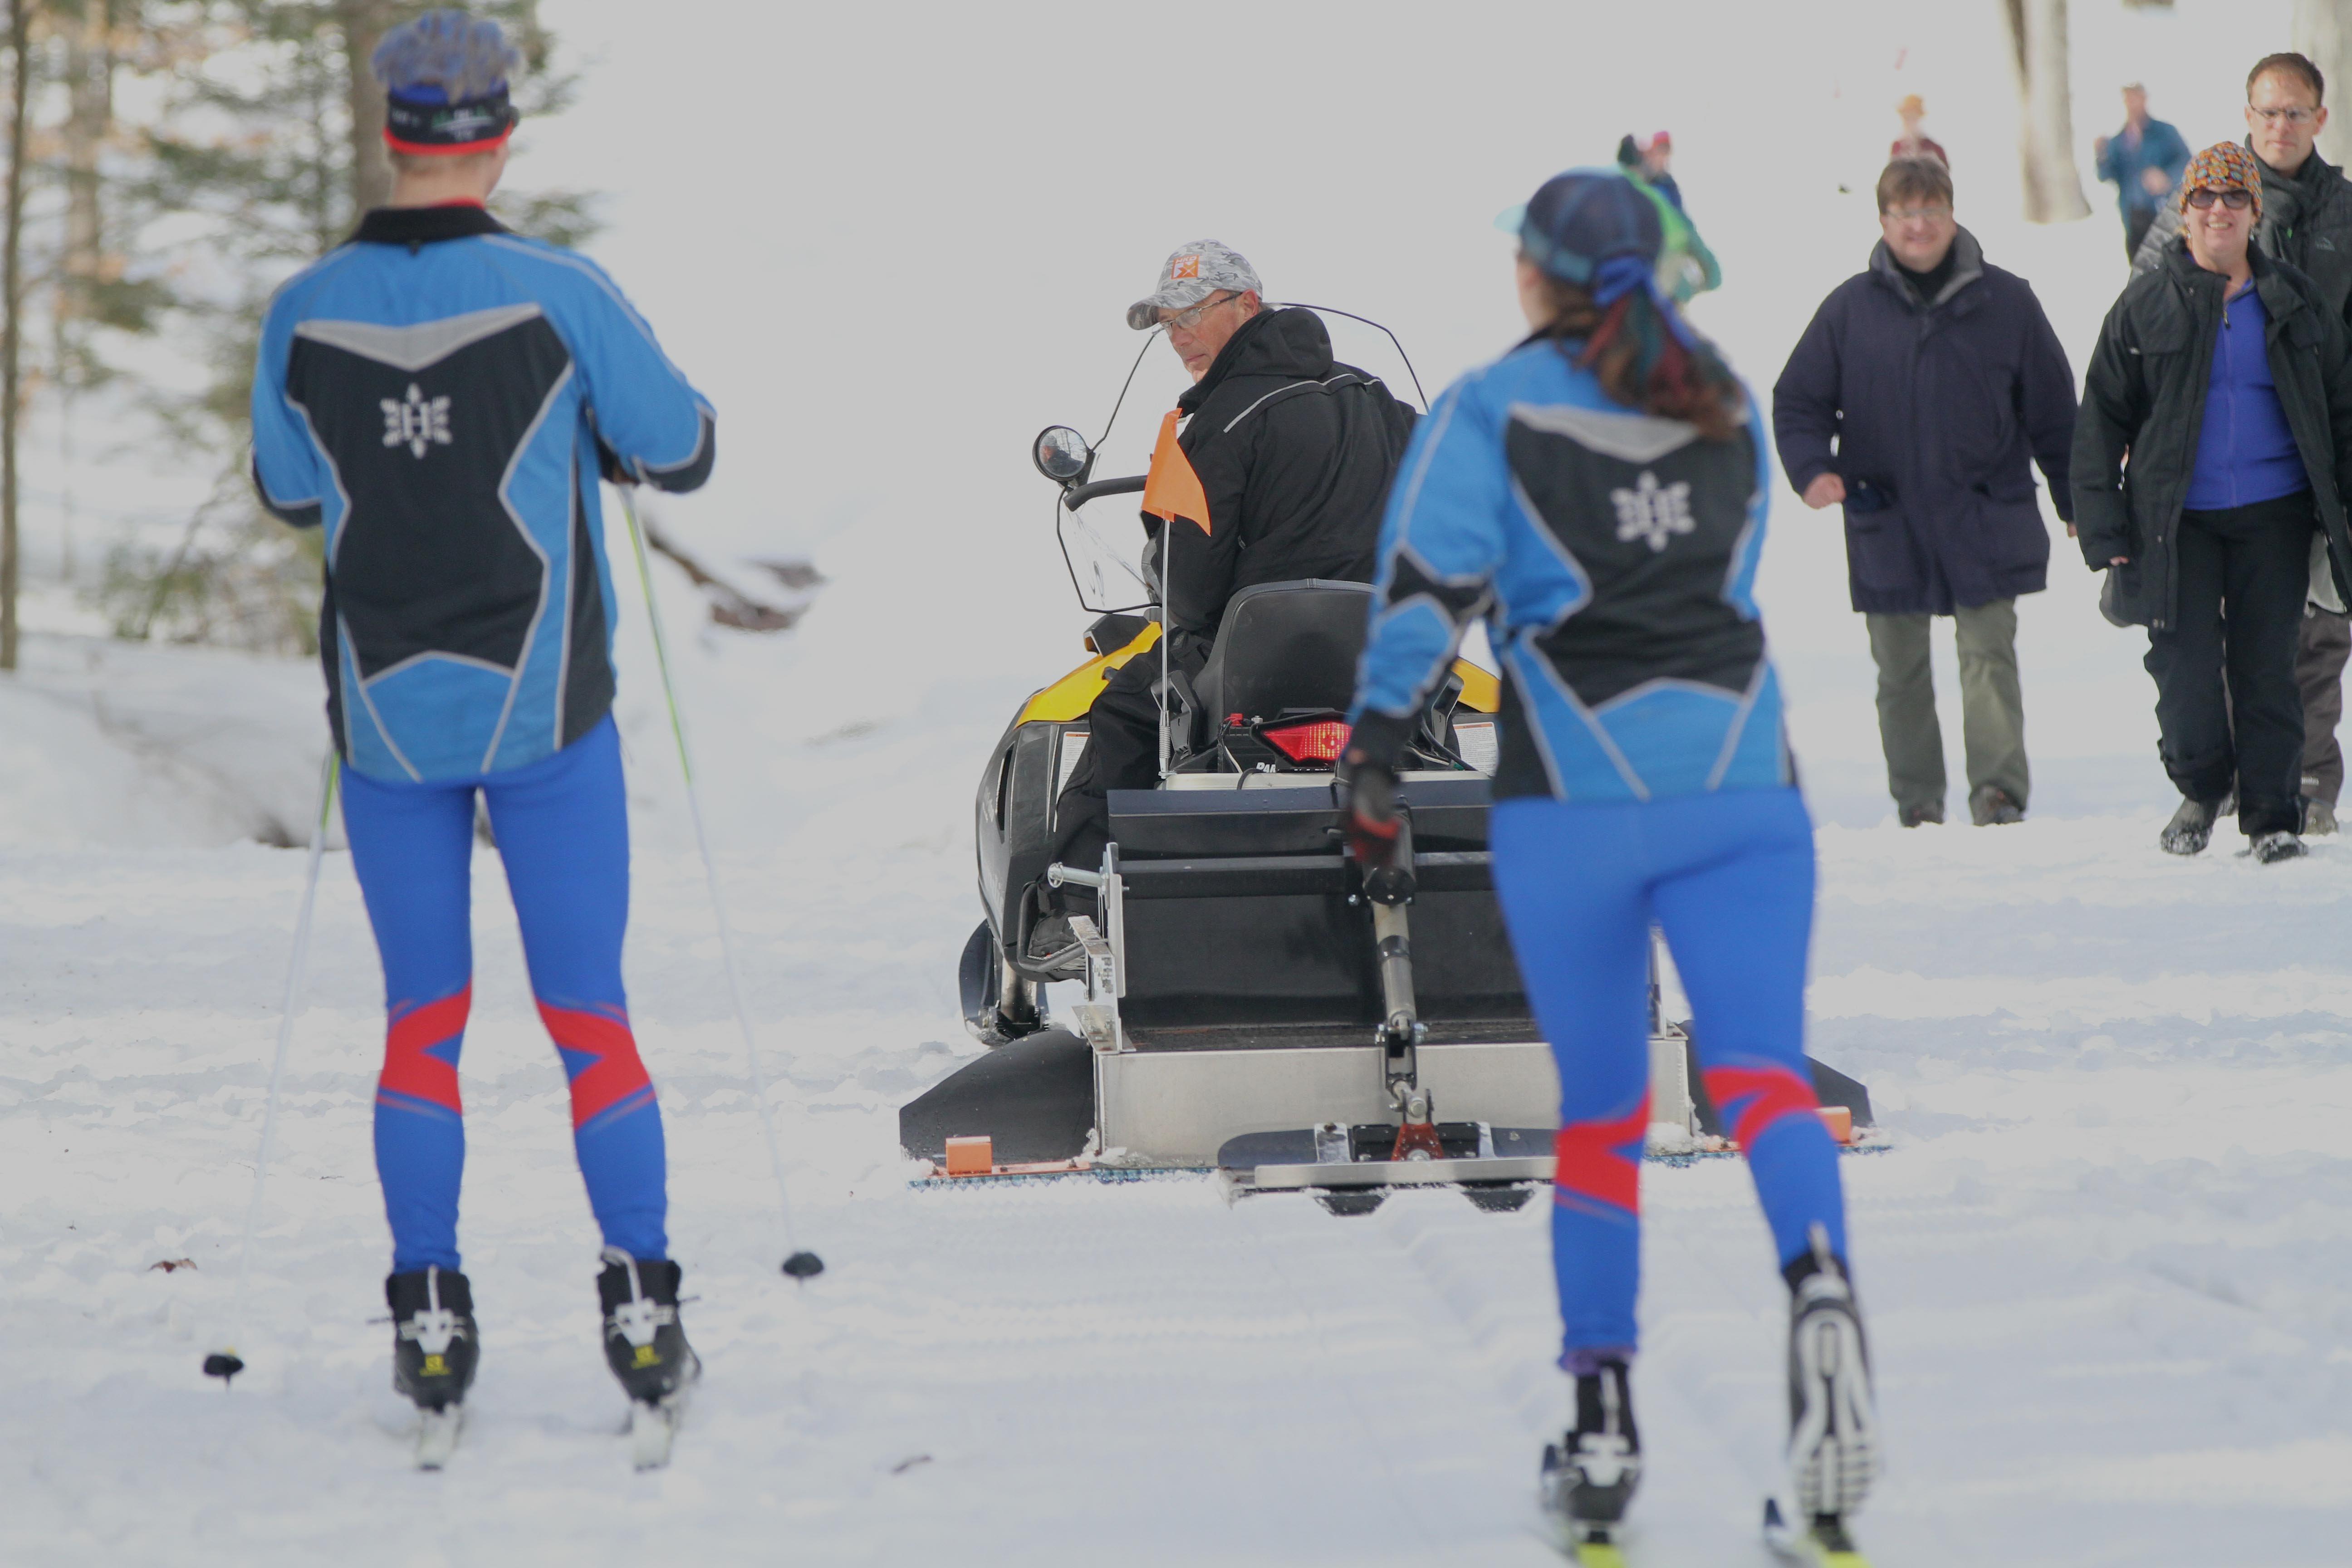 Proctor Academy Ski Area Boarding School